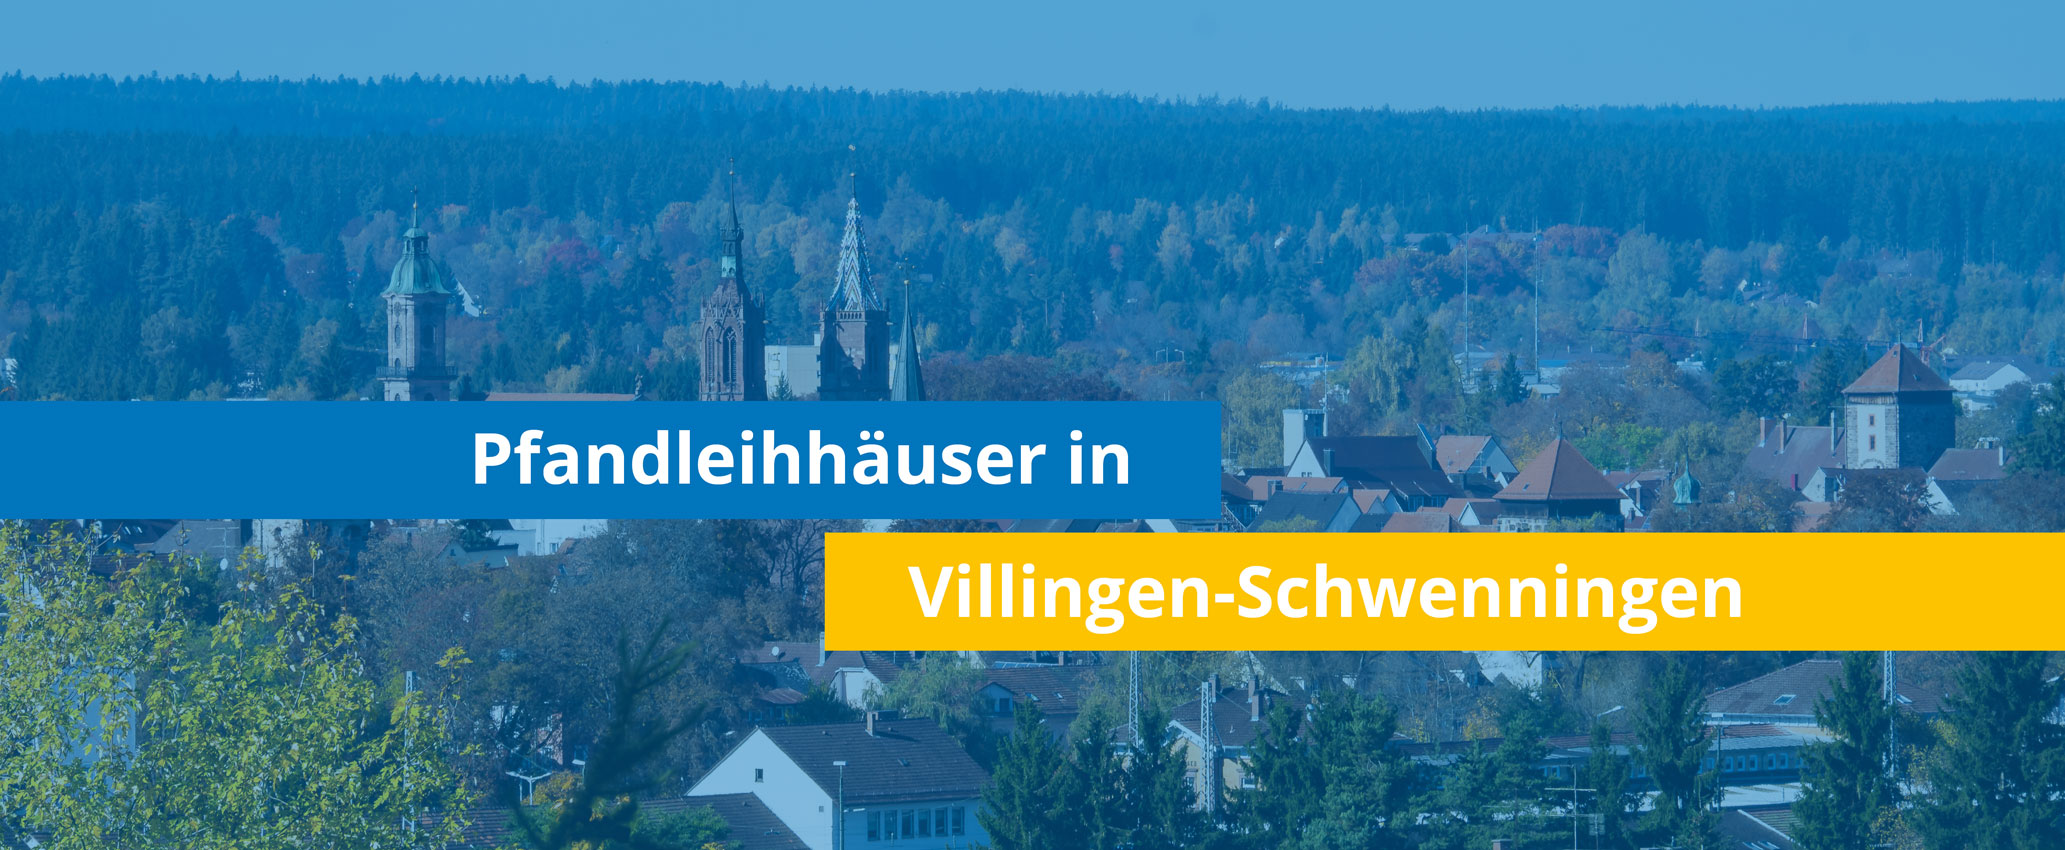 Leihhäuser in Villingen-Schwenningen